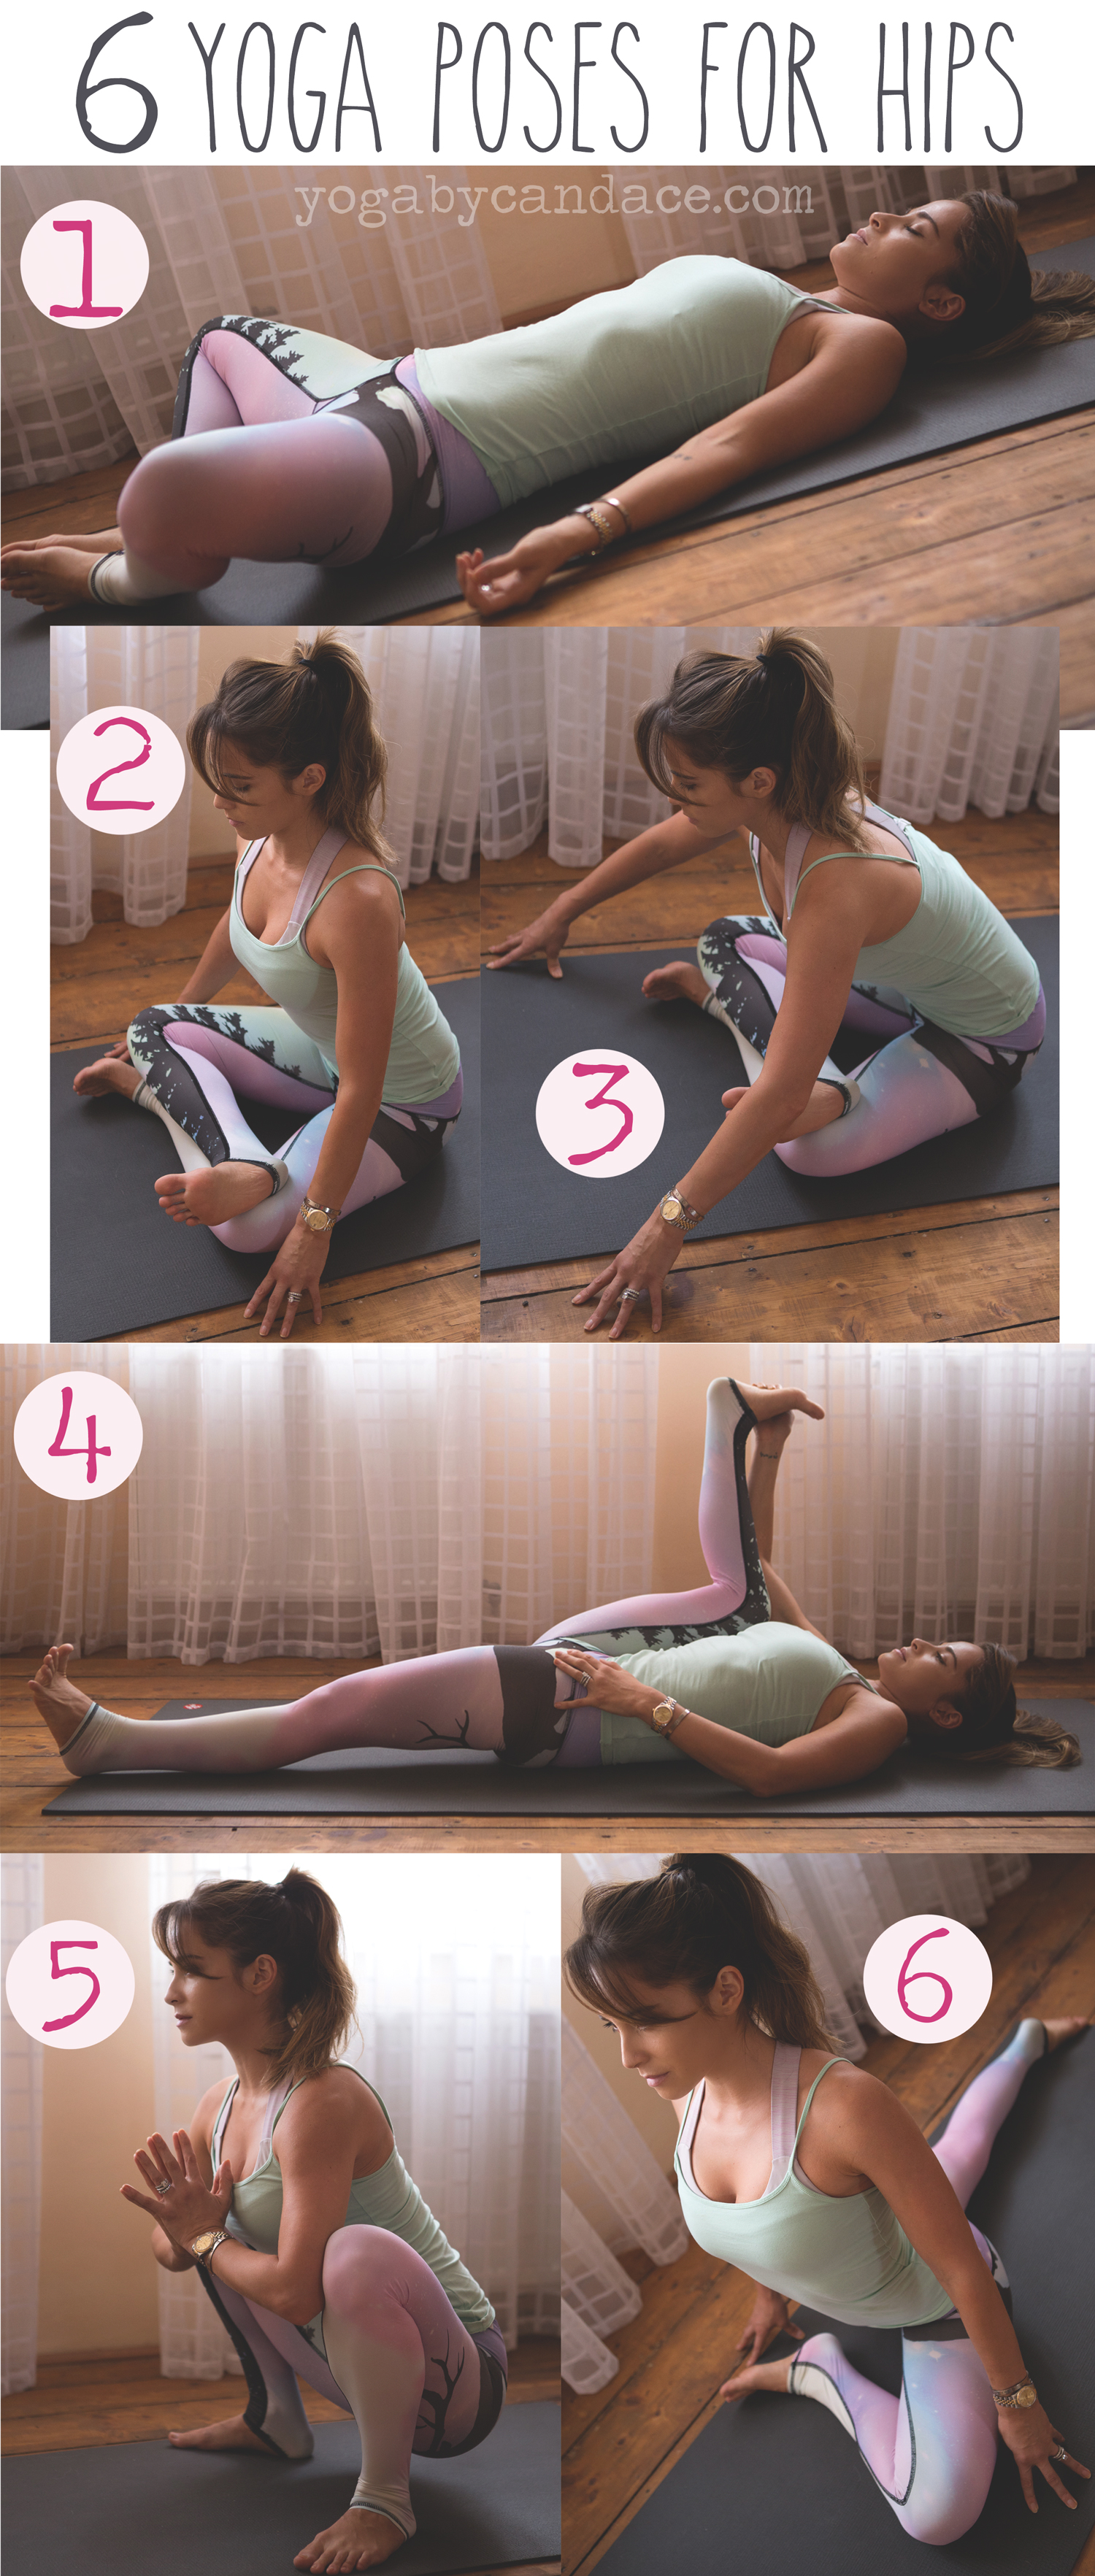 Pin now, practice later! 6 yoga poses for hips!  Wearing:  Teeki northern lights pants ,  tank . Using:  Manduka mat